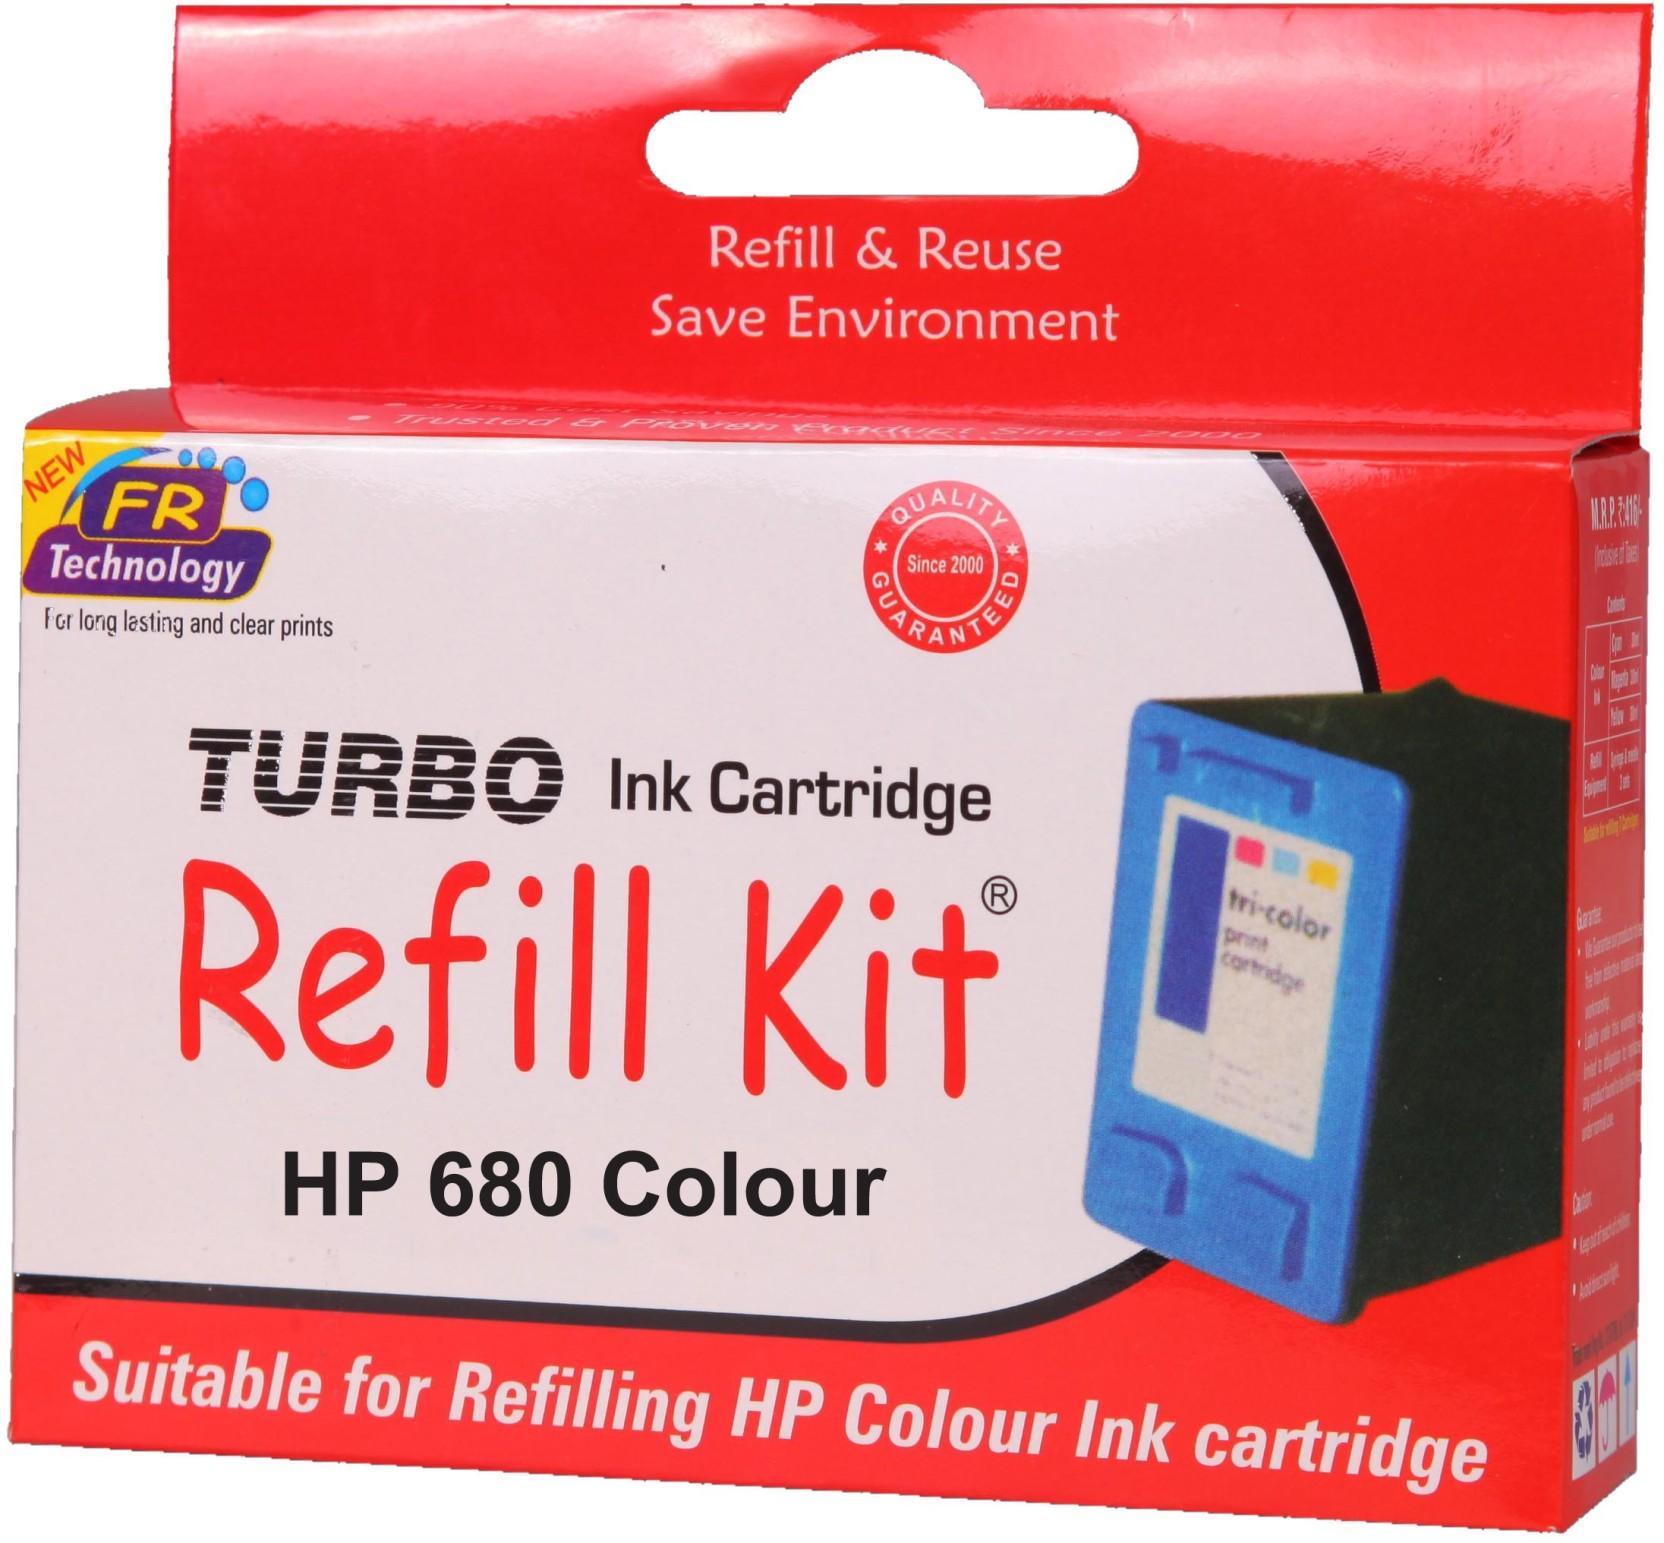 Turbo Ink Refill Kit For Hp 680 Color Cartridge Multi Tri Original Advantage Add To Cart